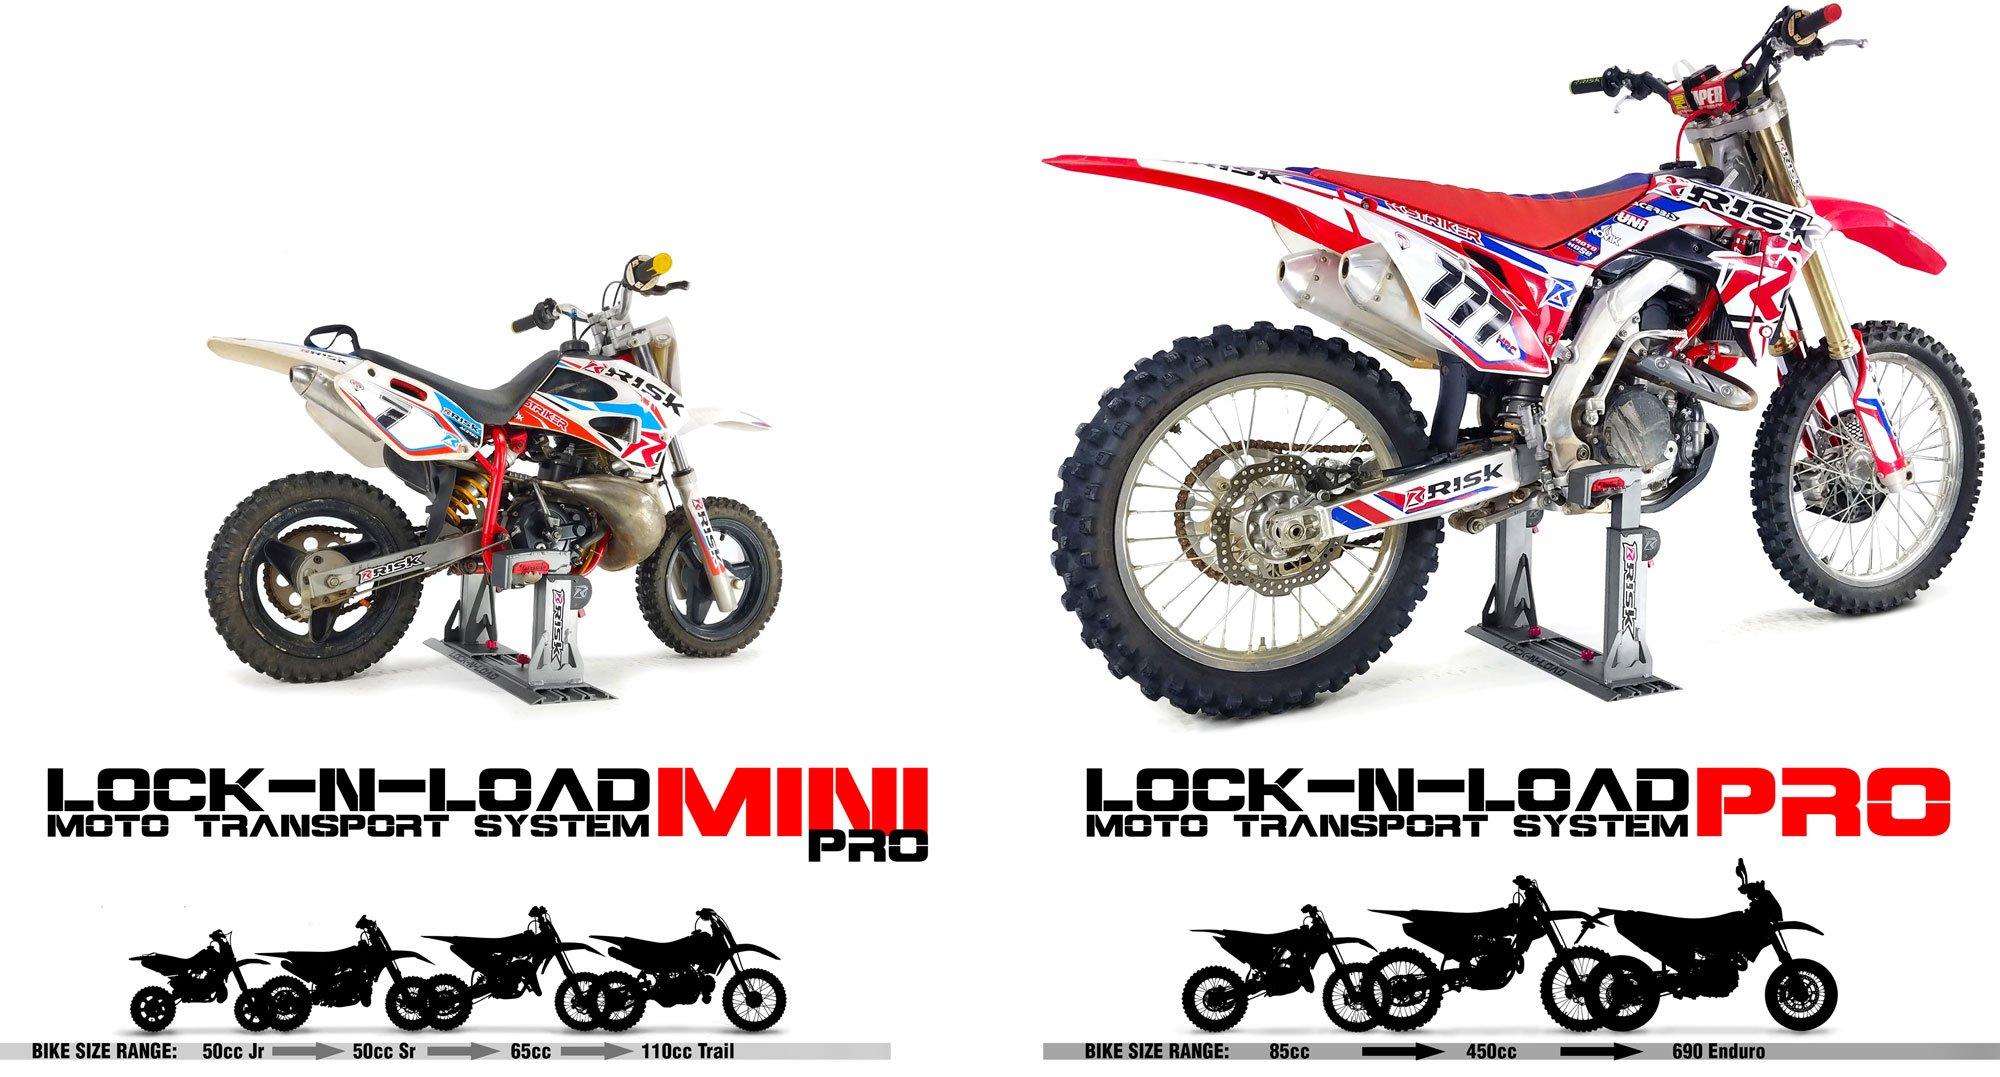 Motociklų transportavimo stovas RISK RACING Lock-N-Load Pro 85cc-450cc